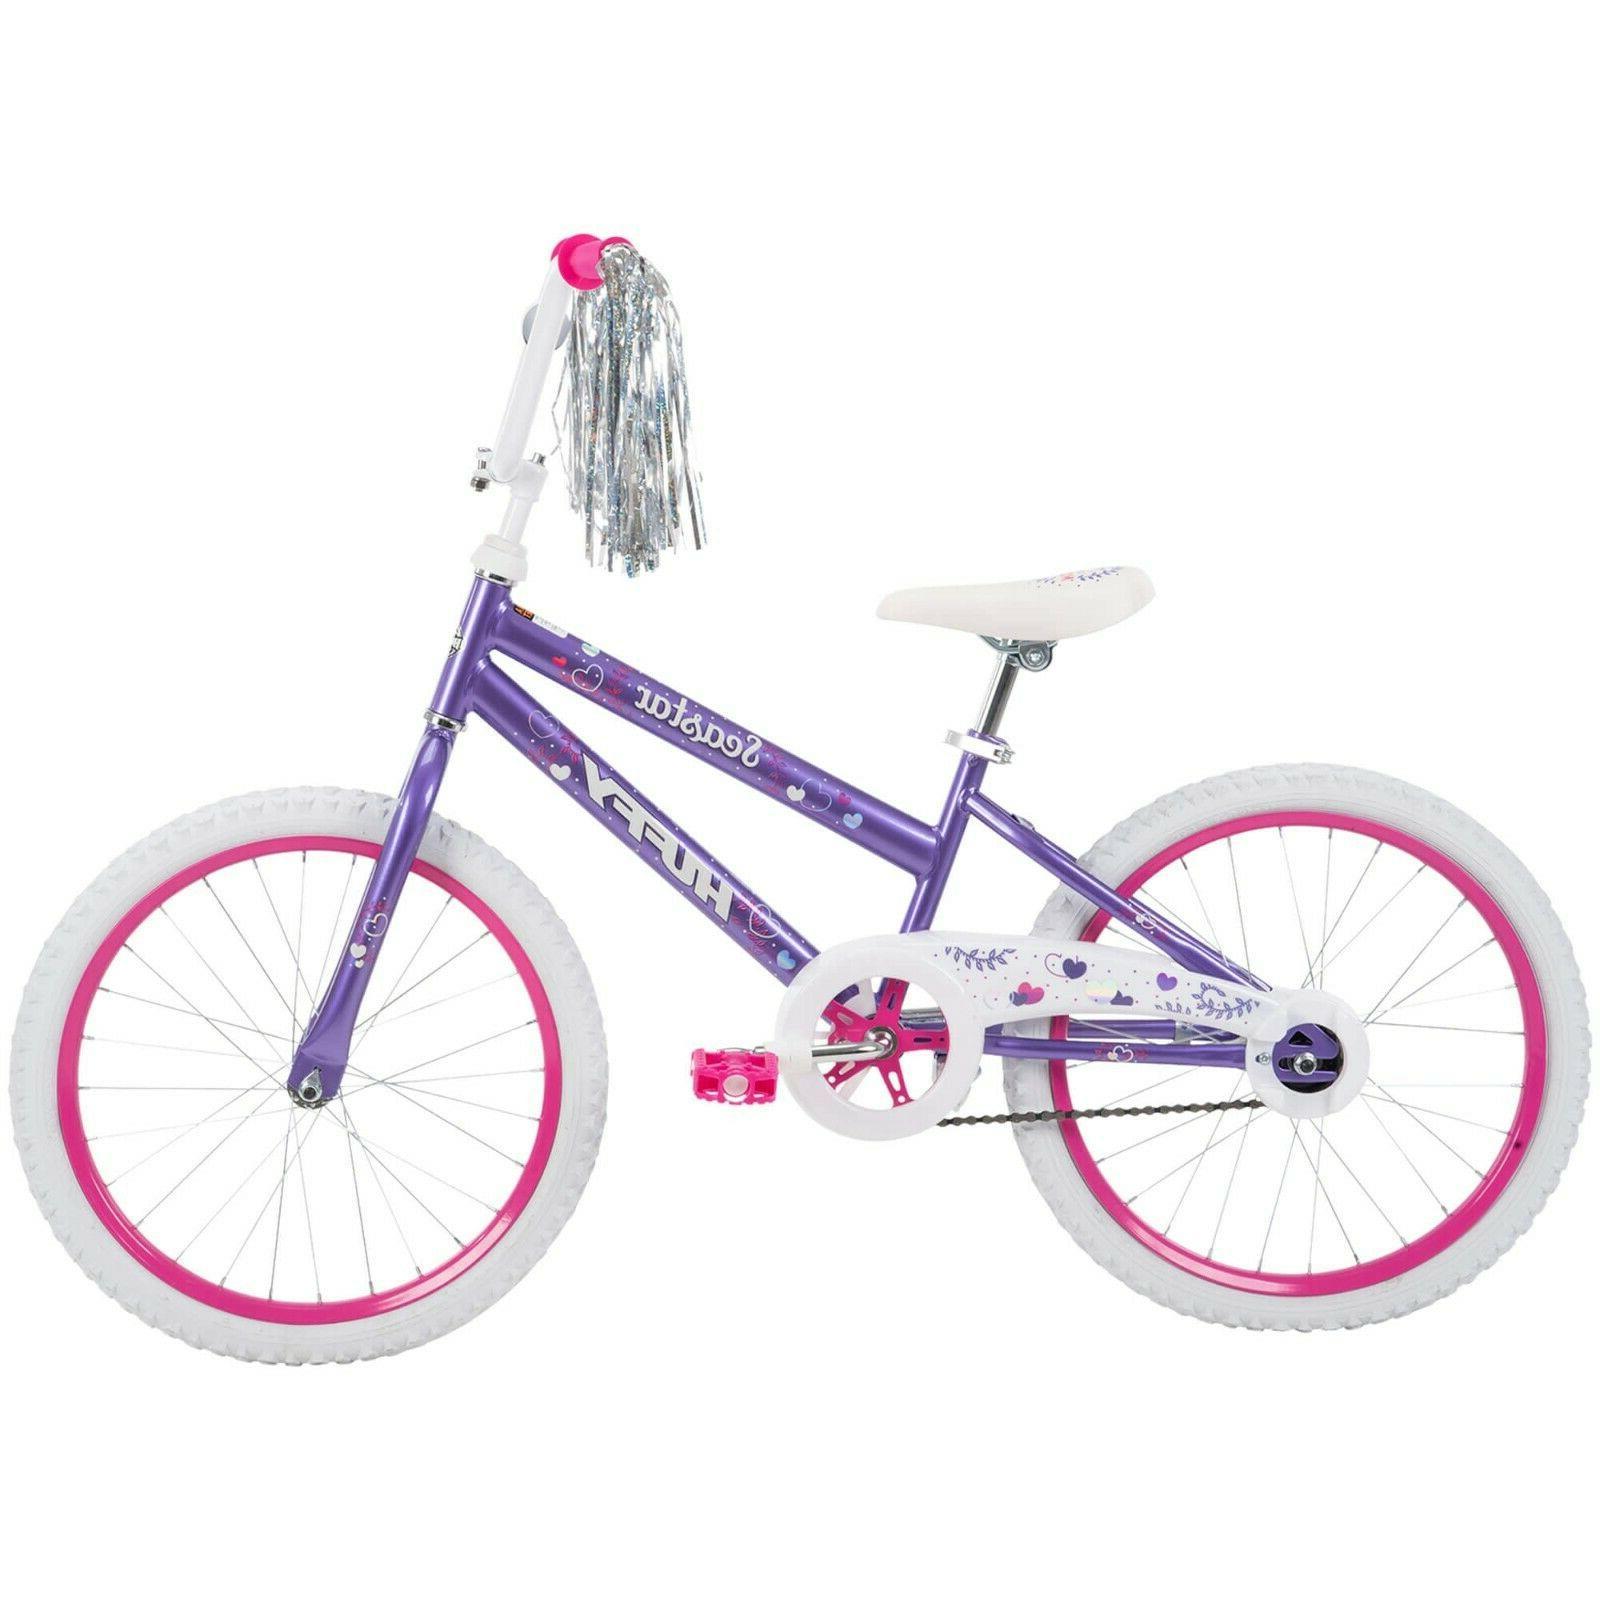 Huffy Star Girls Bike for Purple